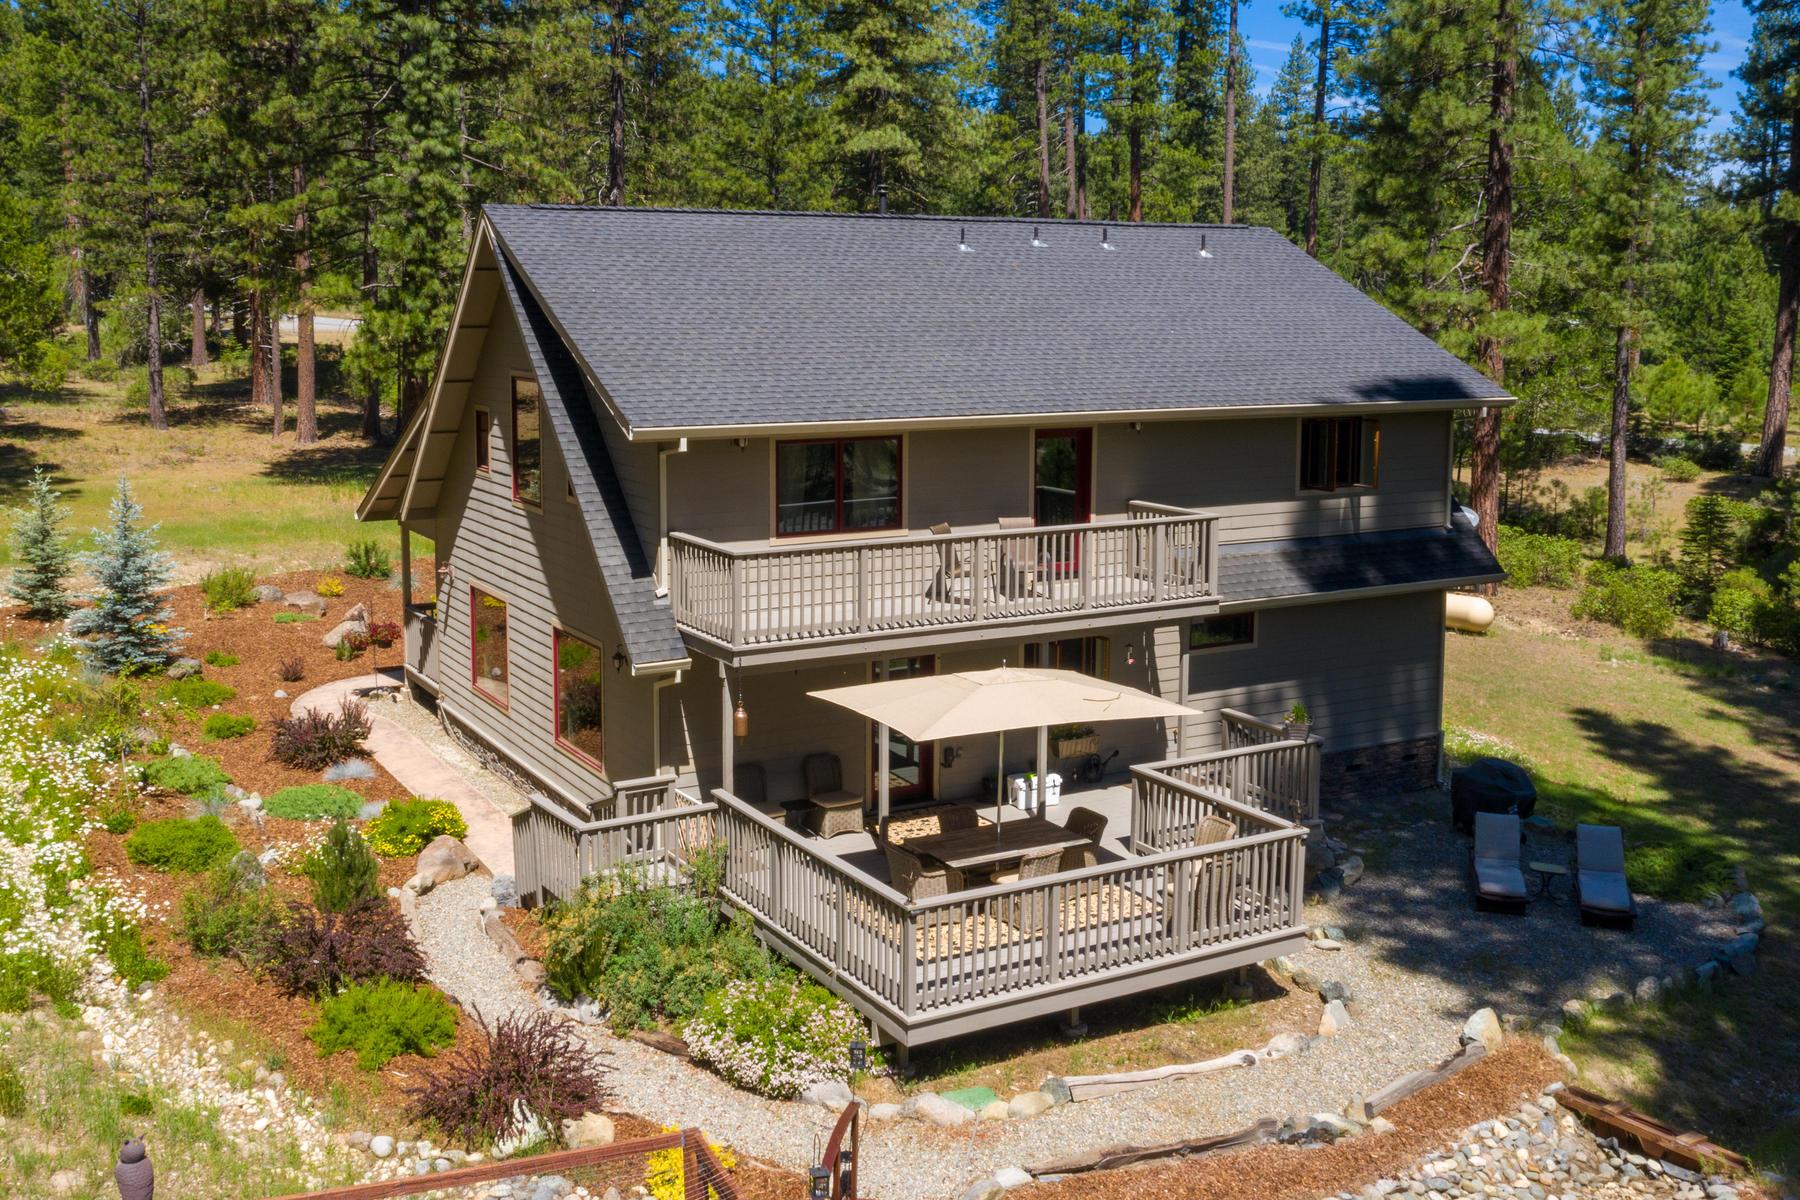 Additional photo for property listing at 523 Eureka Springs Drive, Blairsden, CA 96103 523 Eureka Springs Drive Blairsden, California 96103 United States